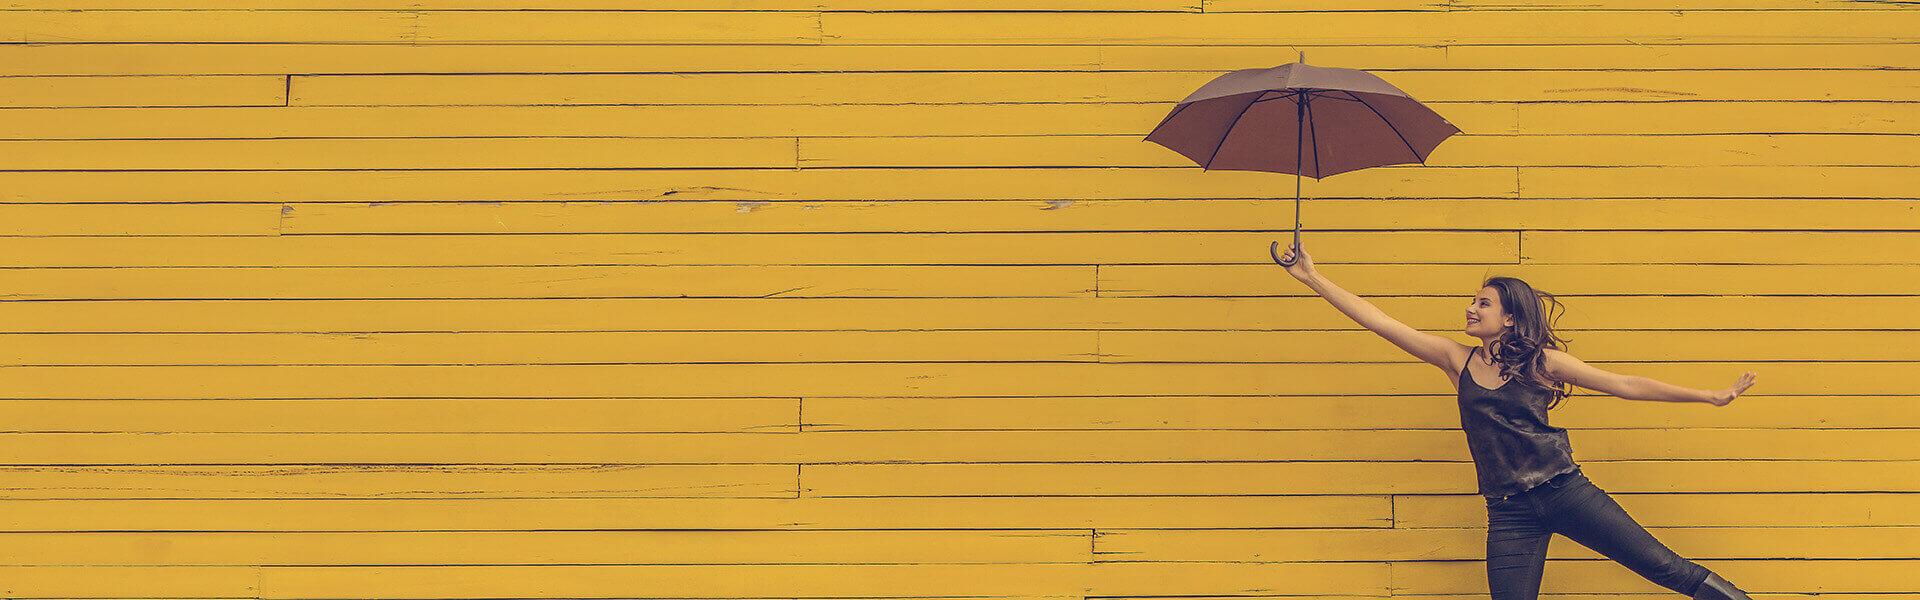 Slider Umbrella